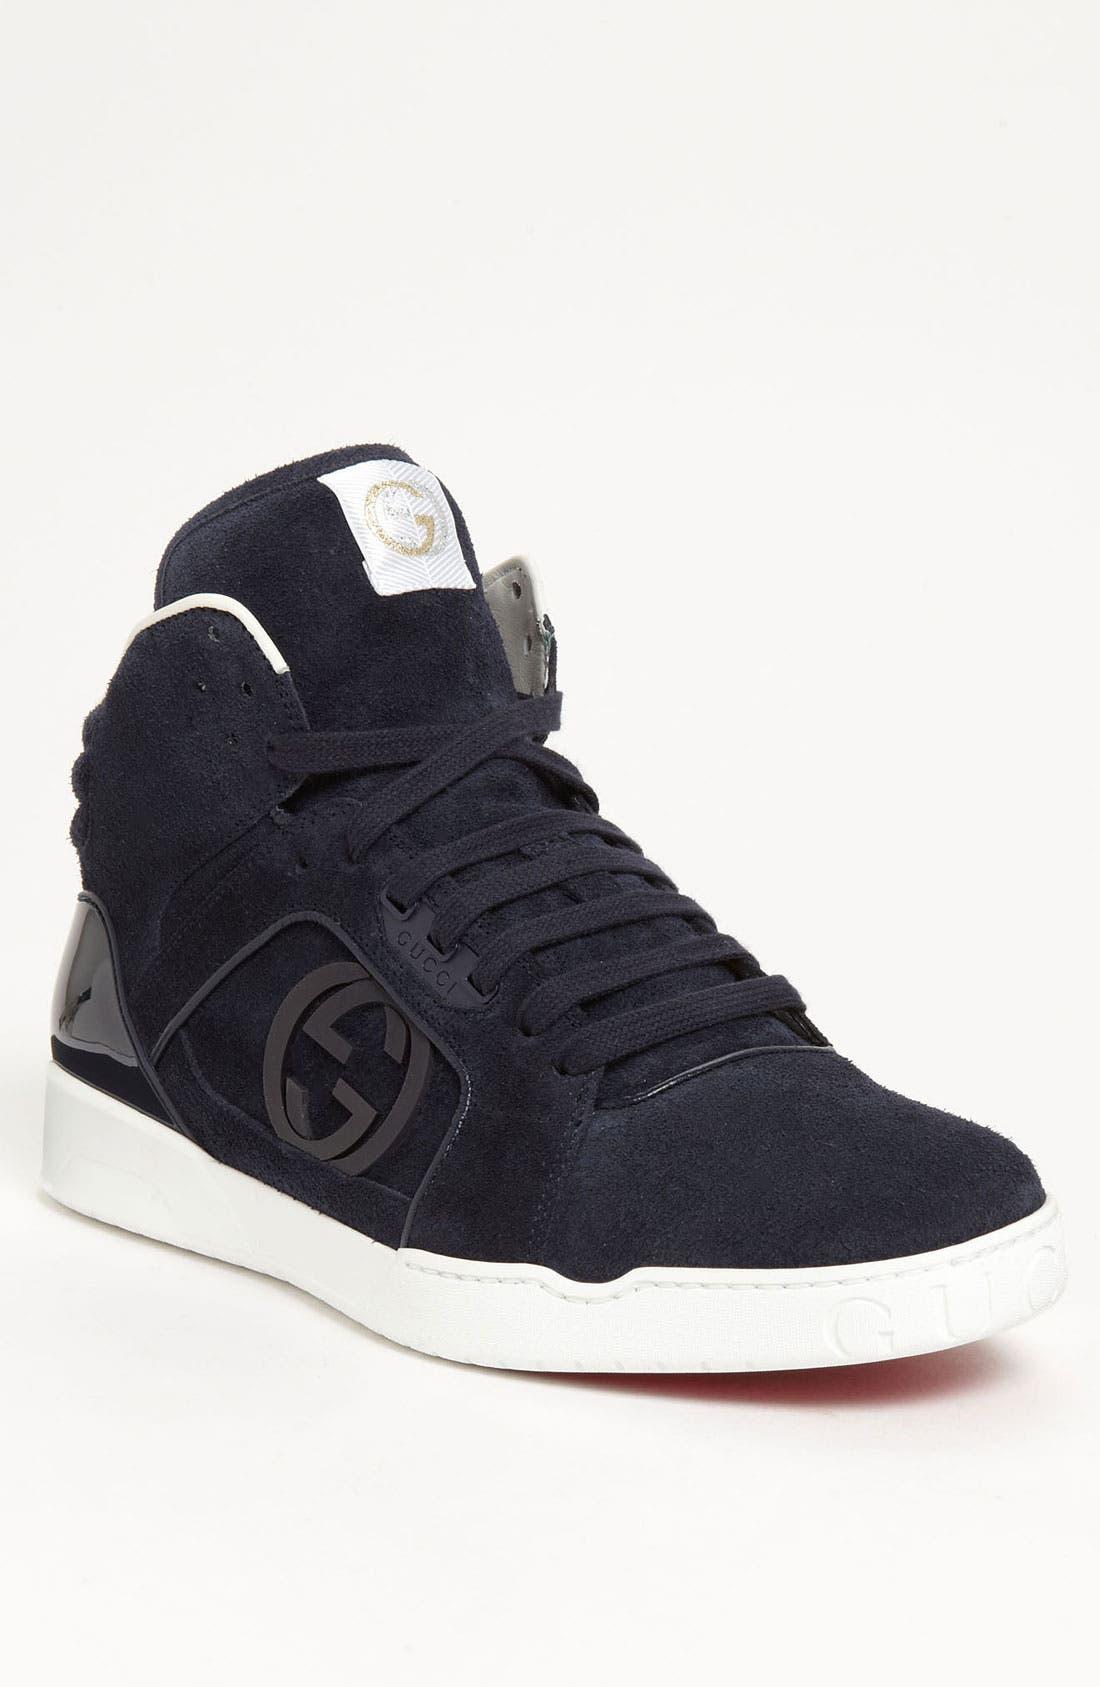 Main Image - Gucci 'Rebound Mid' Sneaker (Men)